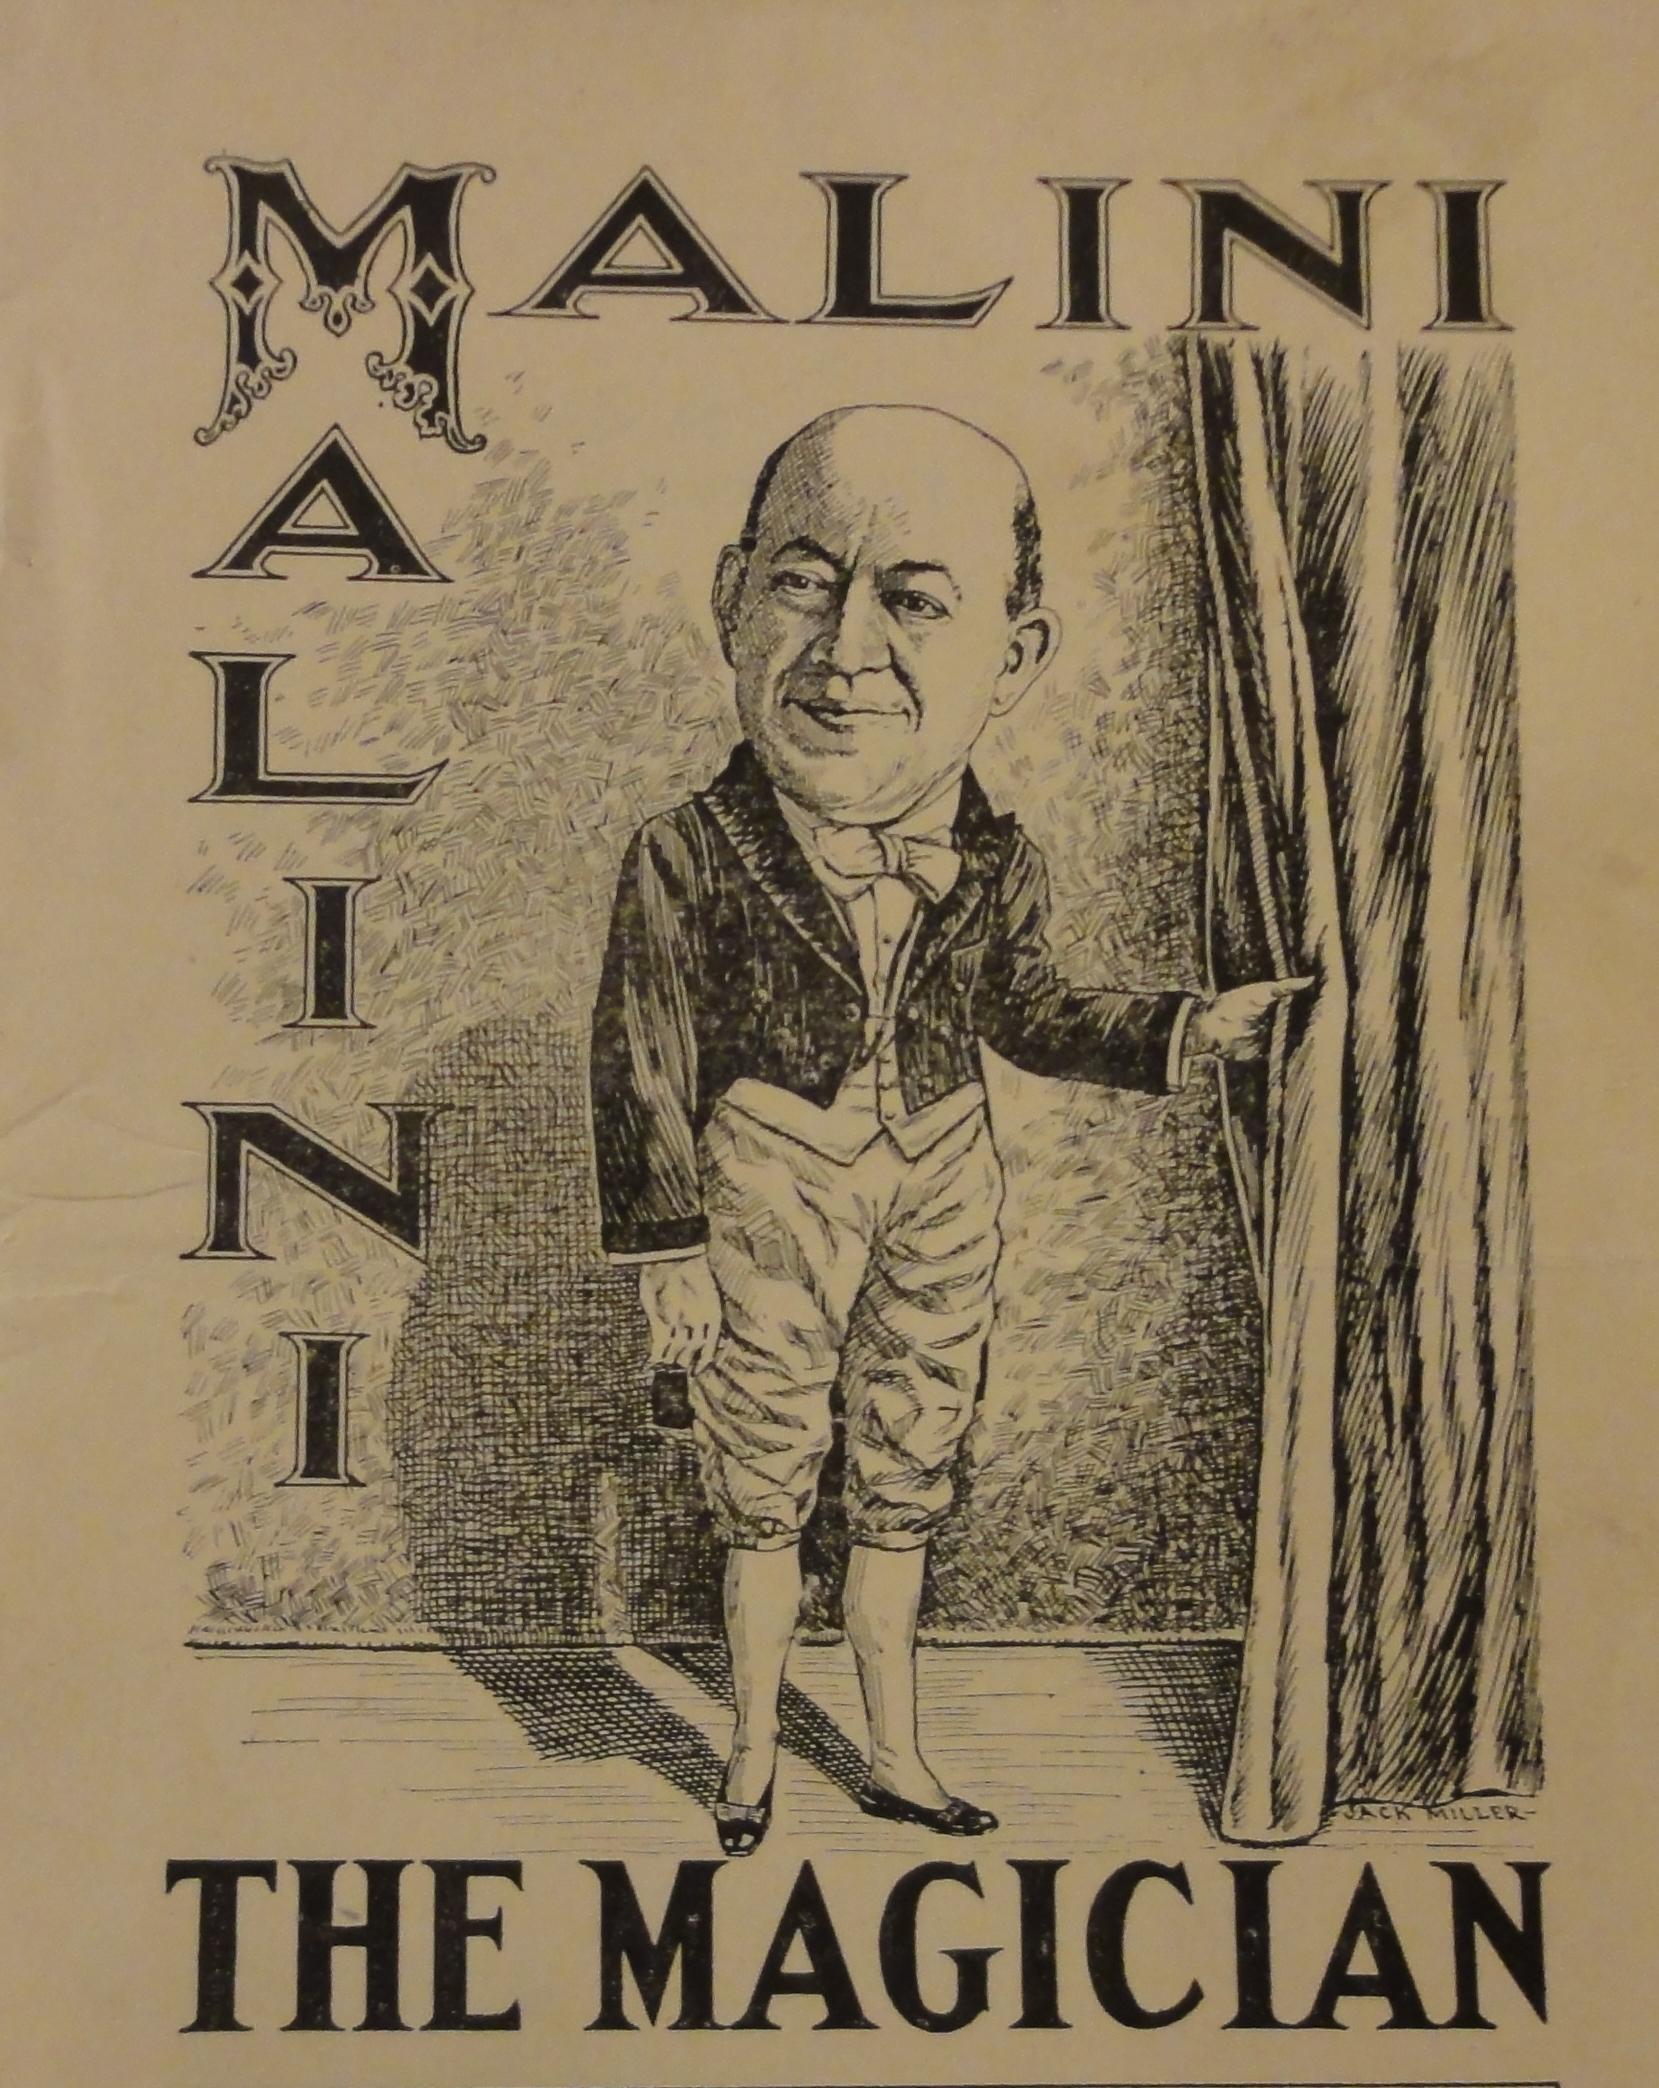 Malini booklet